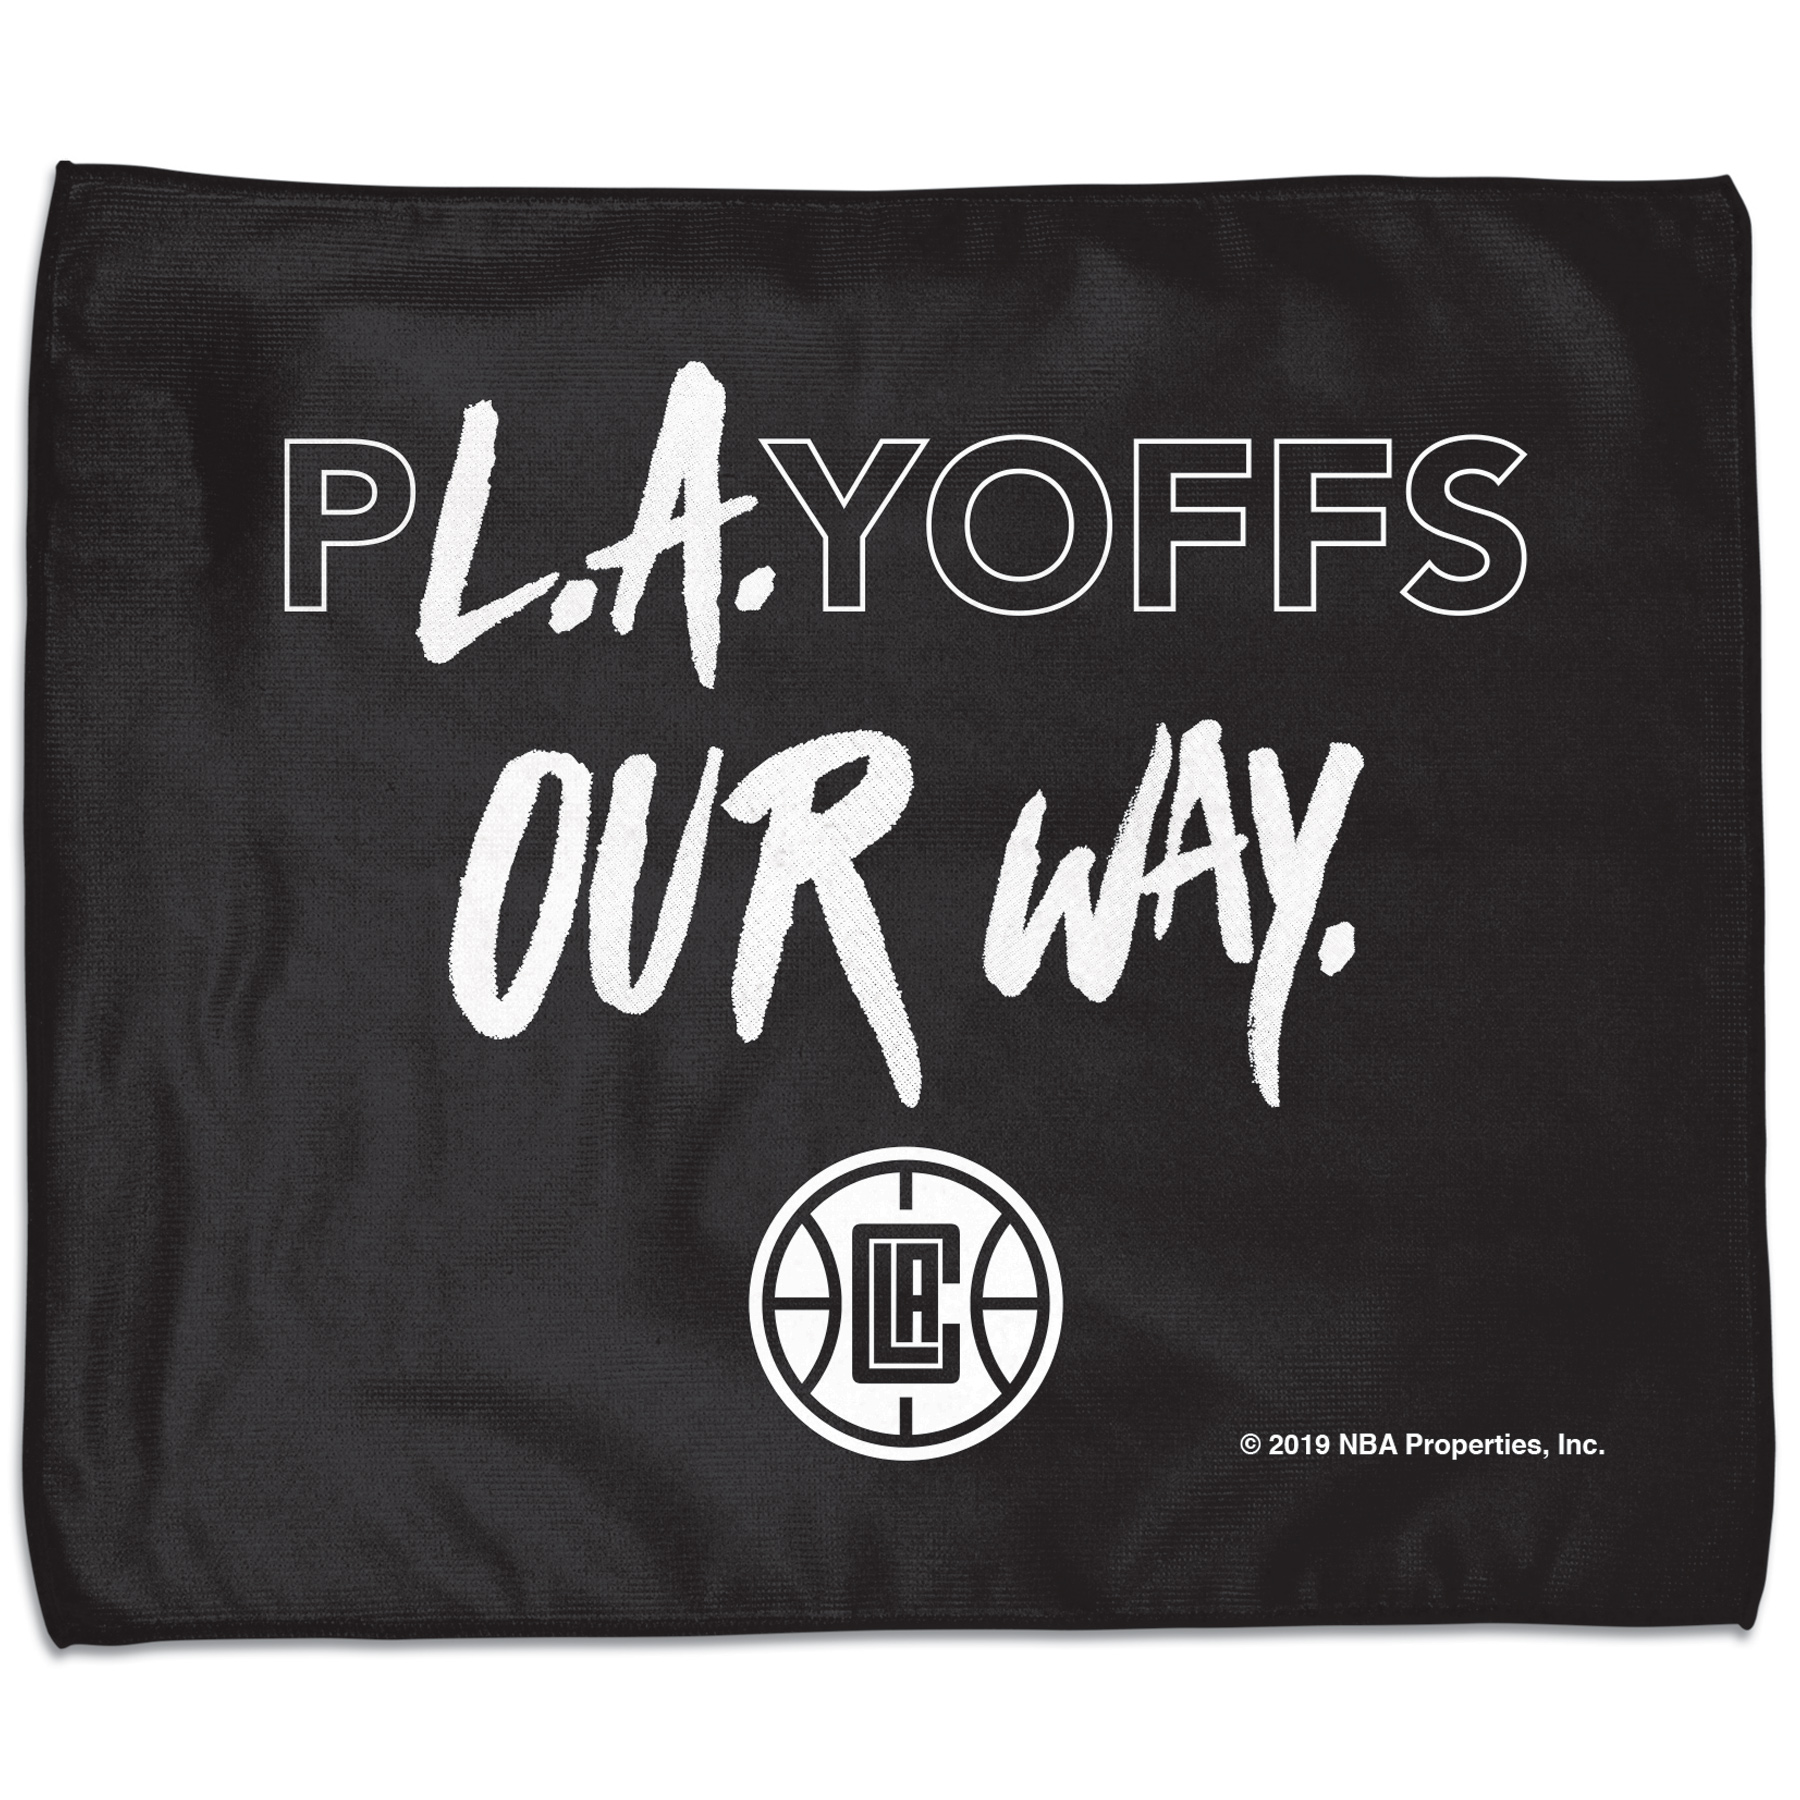 LA Clippers WinCraft 2019 NBA Playoffs Bound 15'' x 18'' Slogan Rally Towel - No Size